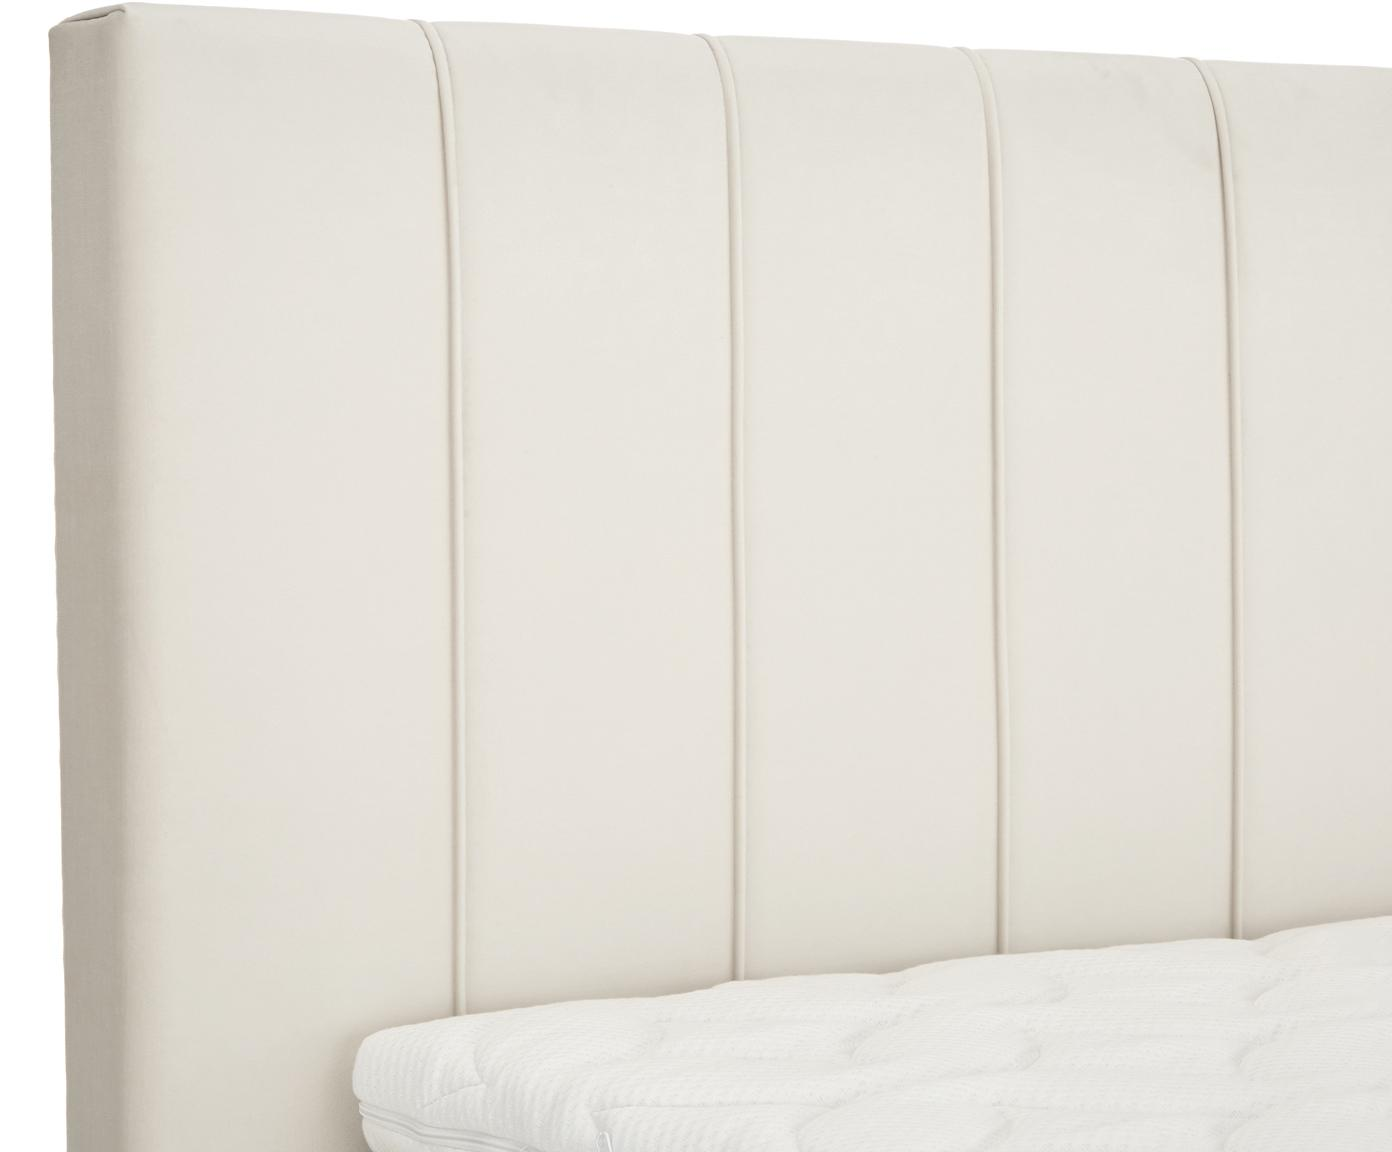 Premium fluwelen boxspring bed Lacey, Matras: 7-zones-pocketveringkern , Poten: massief gelakt beukenhout, Beige, 140 x 200 cm